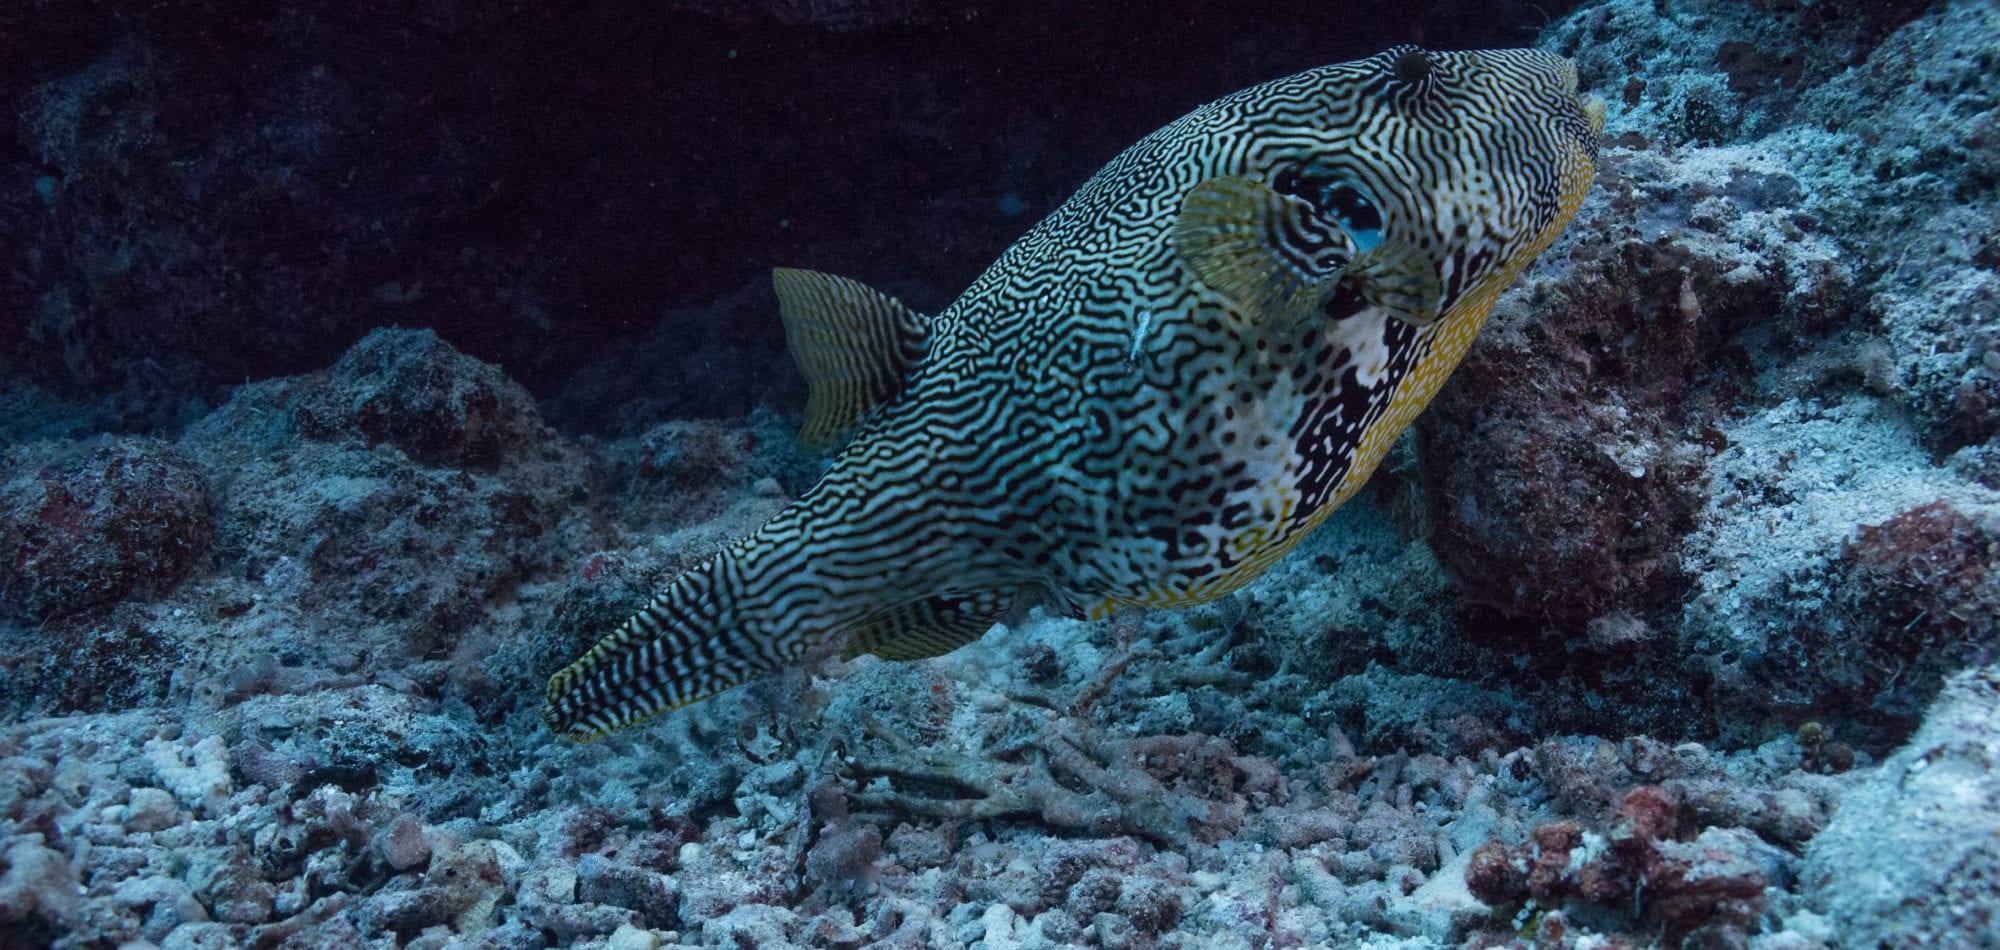 Whitsundays dive experience - box puffer fish